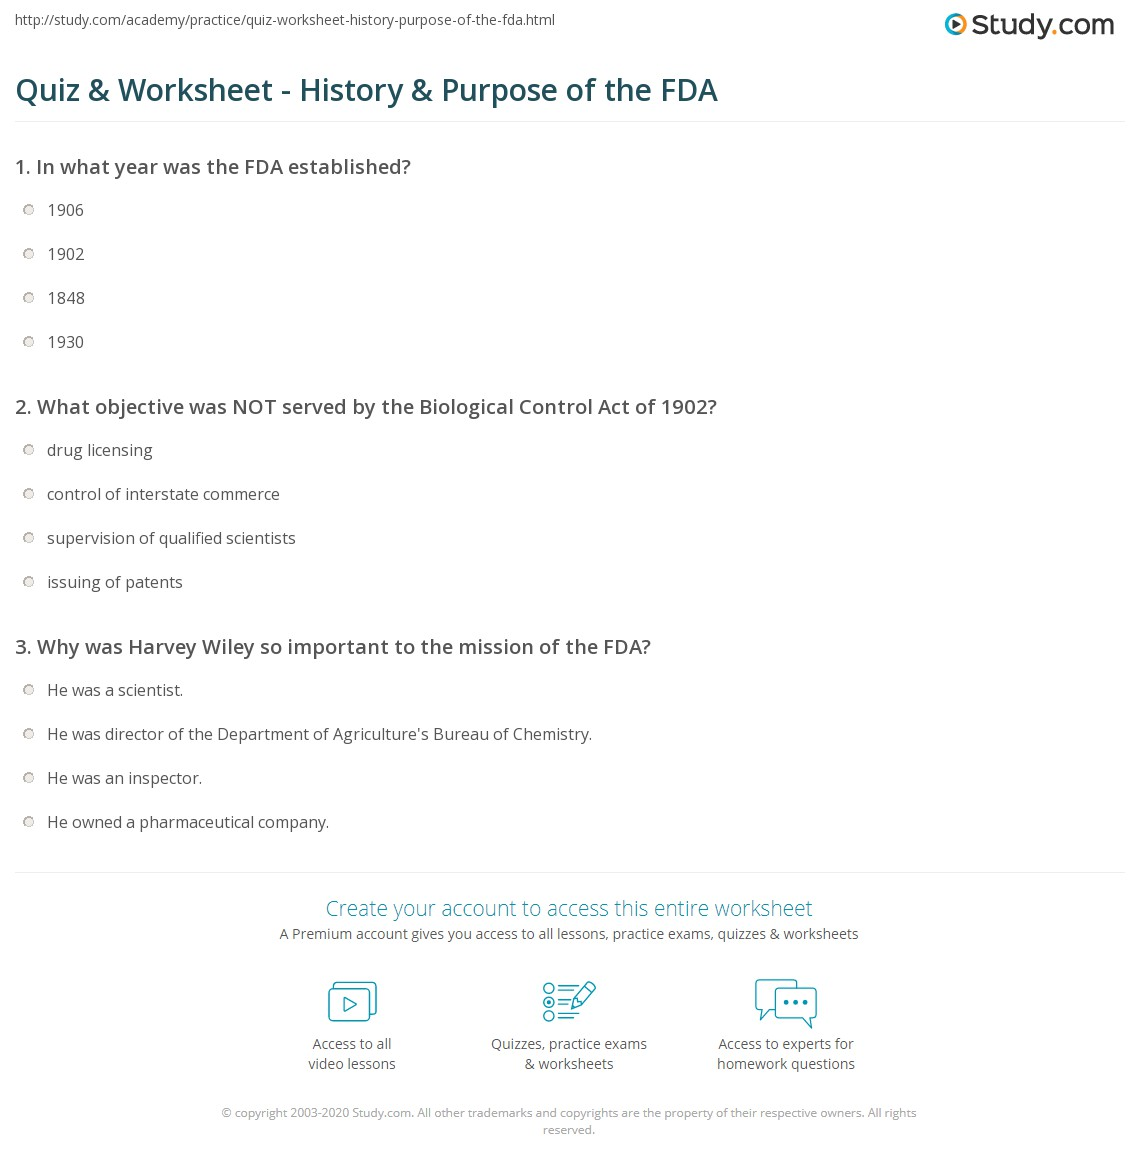 Quiz & Worksheet - History & Purpose of the FDA   Study com